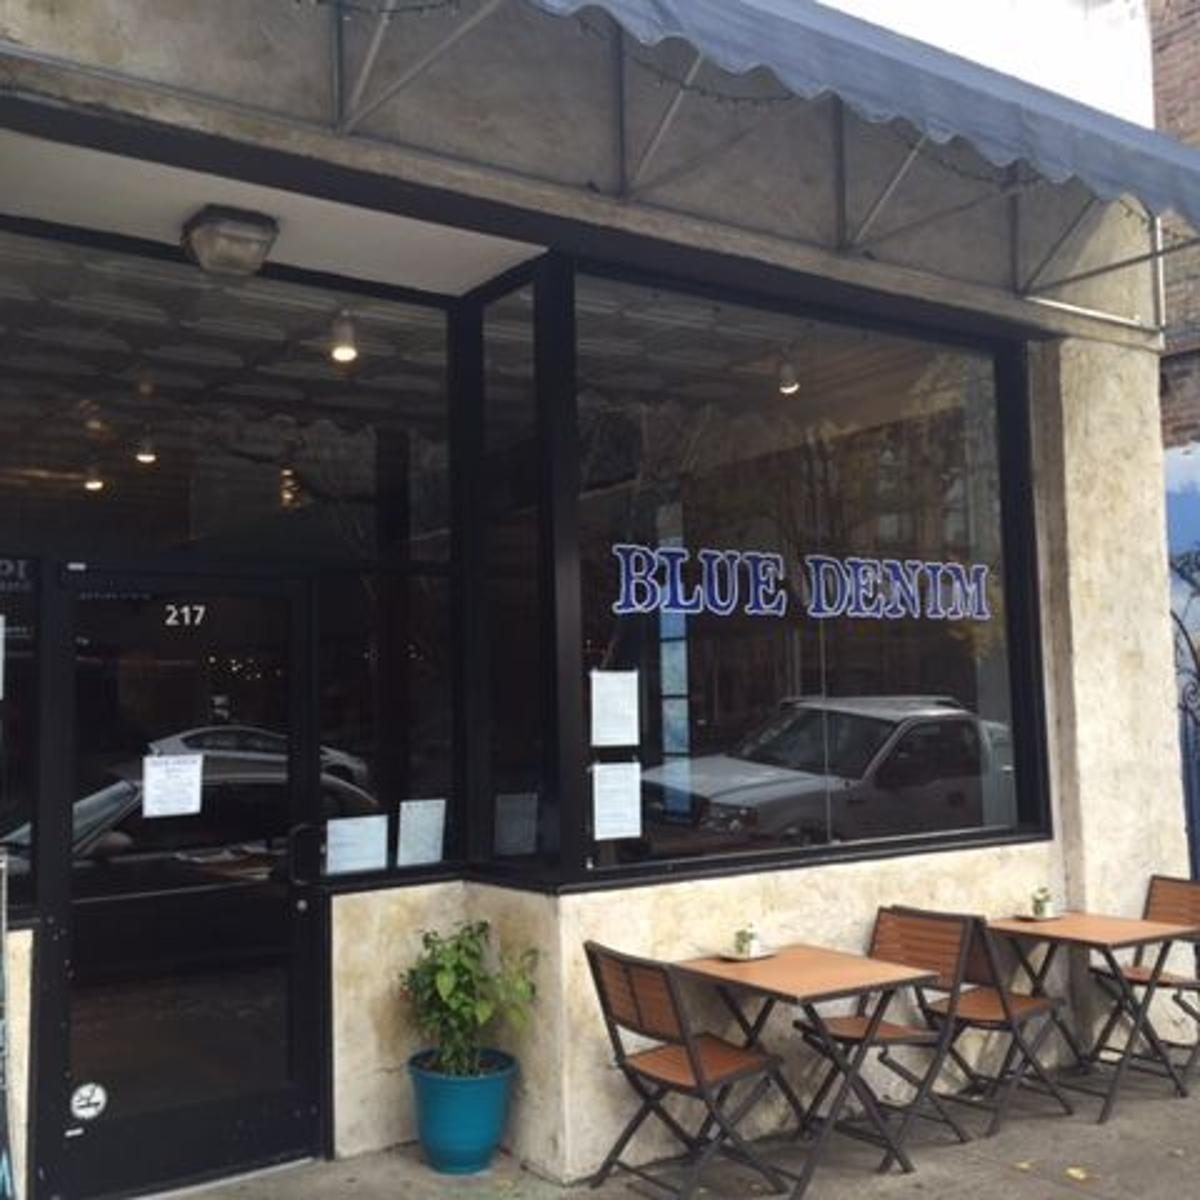 Restaurant Reviewer John Batchelor Shares His Favorite 10